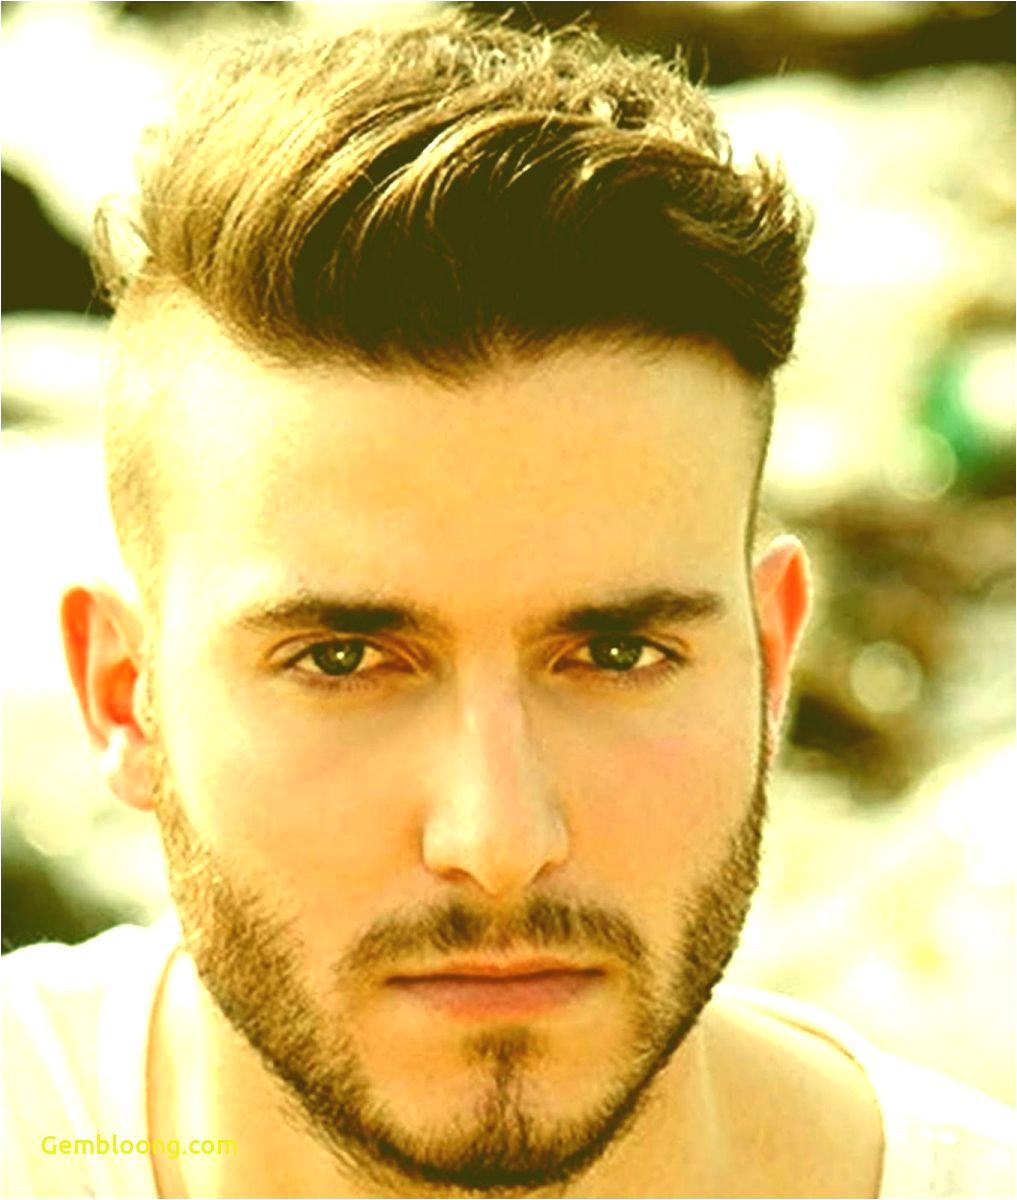 Short Hairstyles for Men New Captivating Short Hairstyles for Men New Hairstyles Men 0d Bright